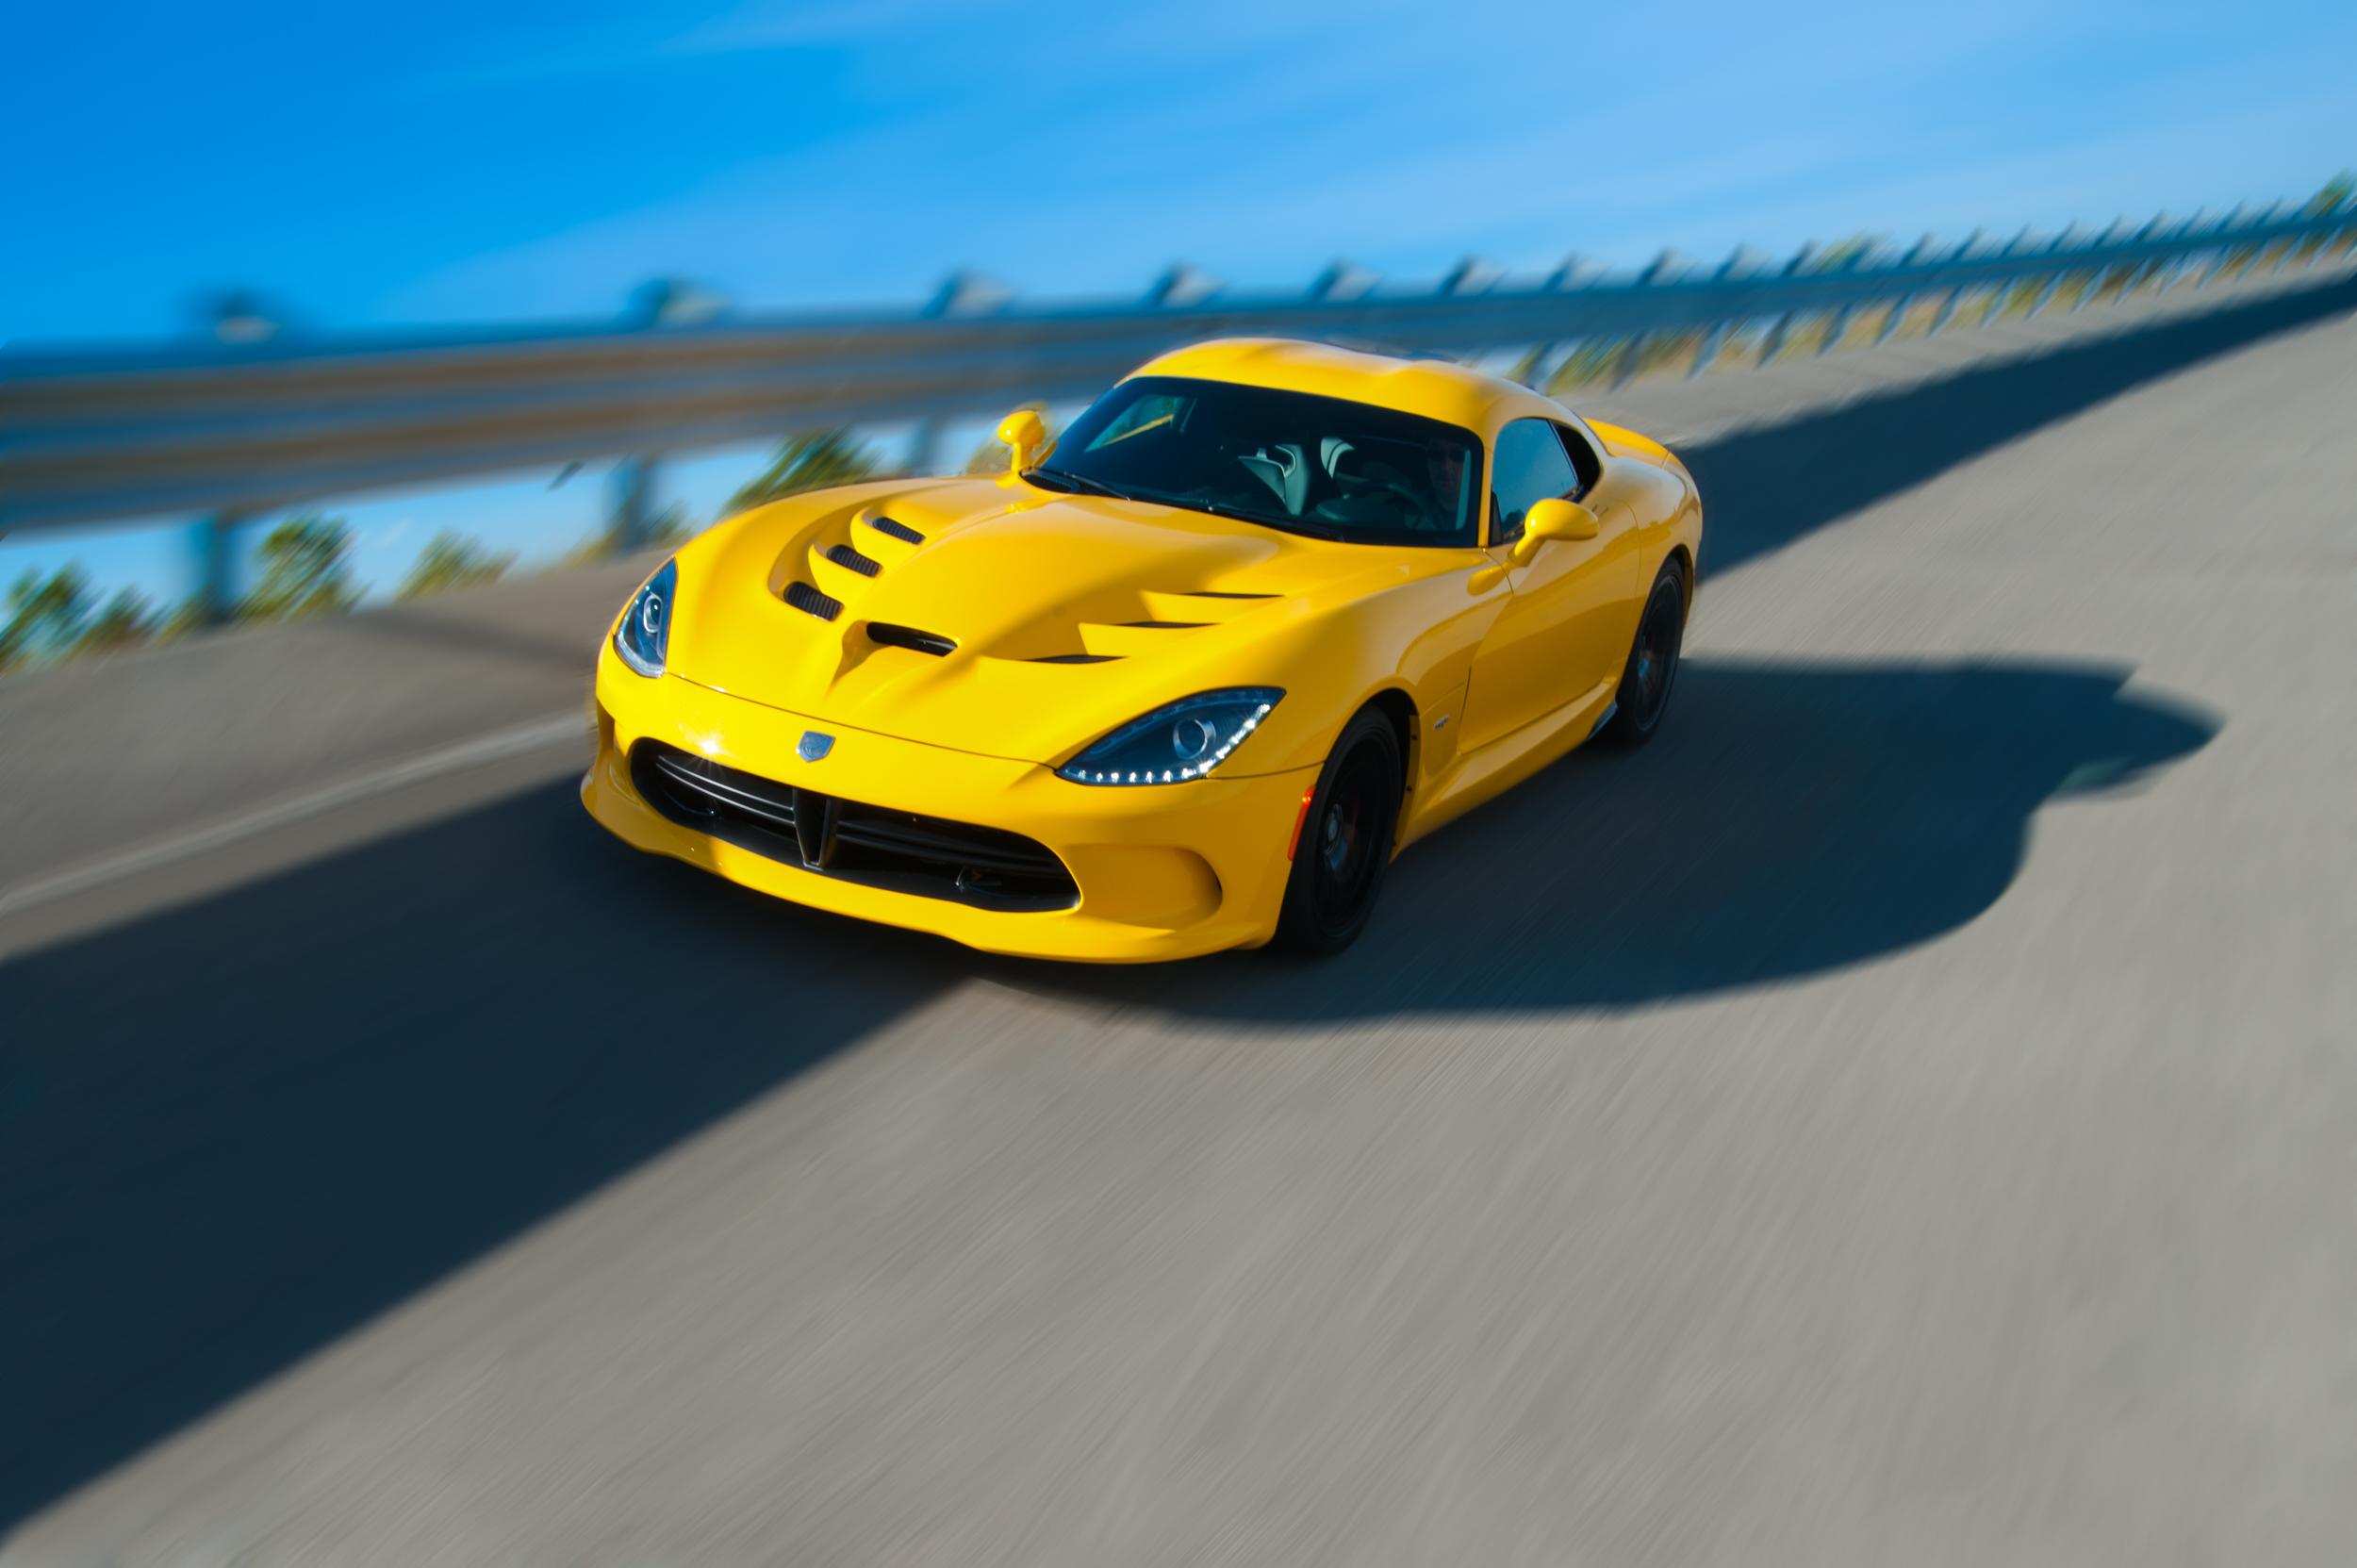 2013 SRT Viper-910-Edit.jpg